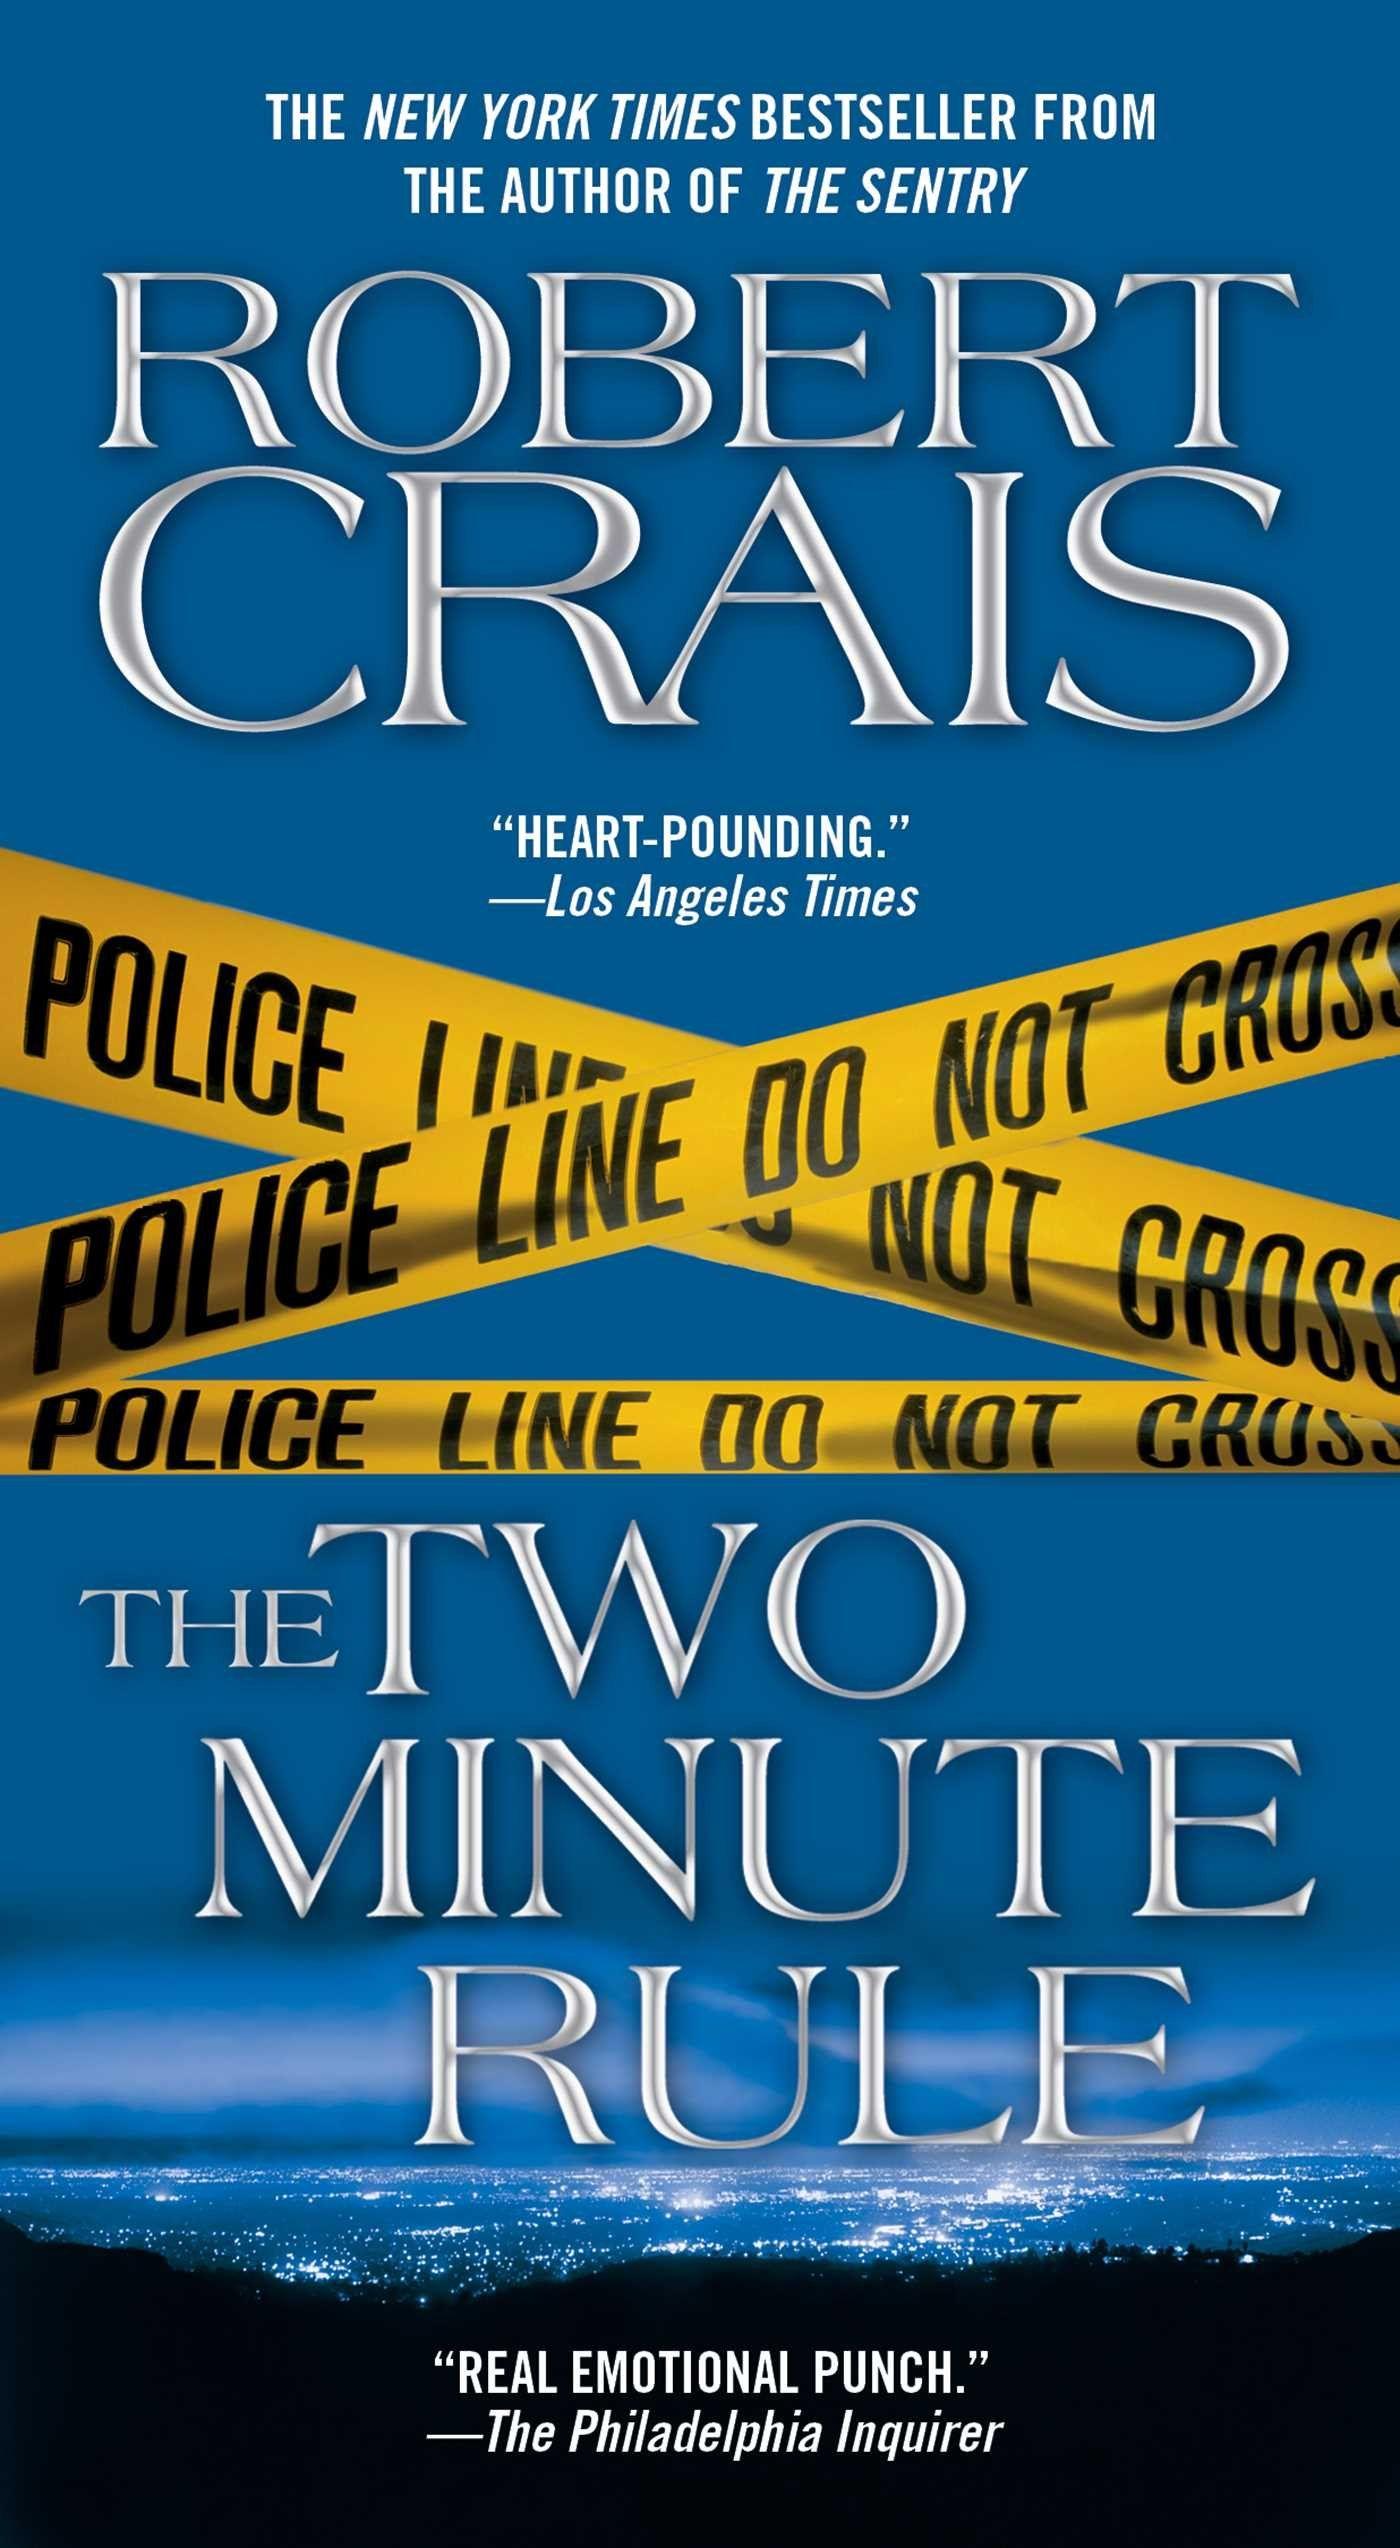 The Two Minute Rule - Kindle edition by Robert Crais. Literature & Fiction Kindle eBooks @ Amazon.com.